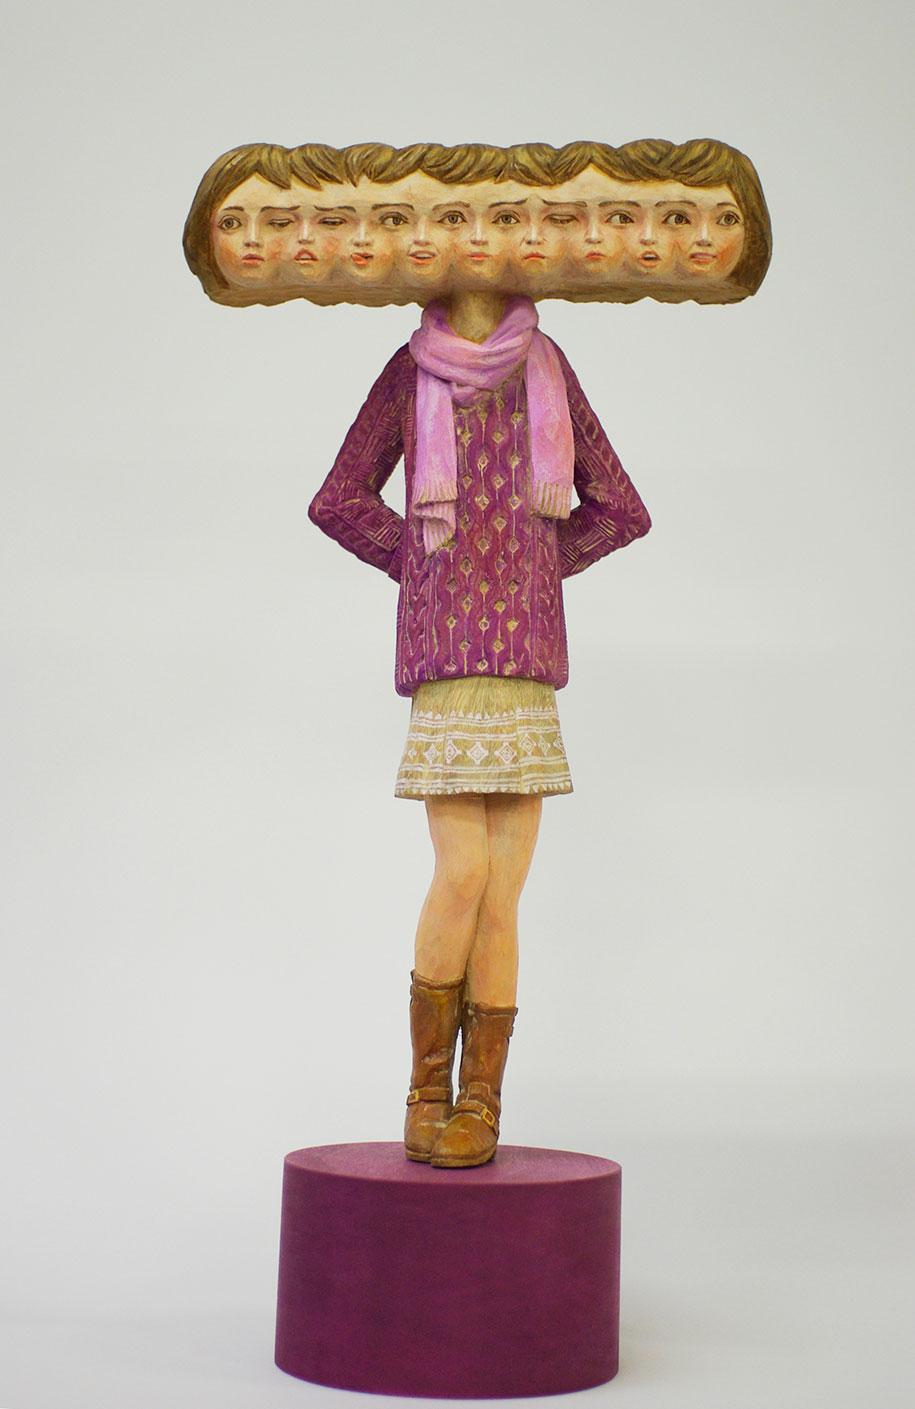 surreal-wooden-sculptures-yoshitoshi-kanemaki-30